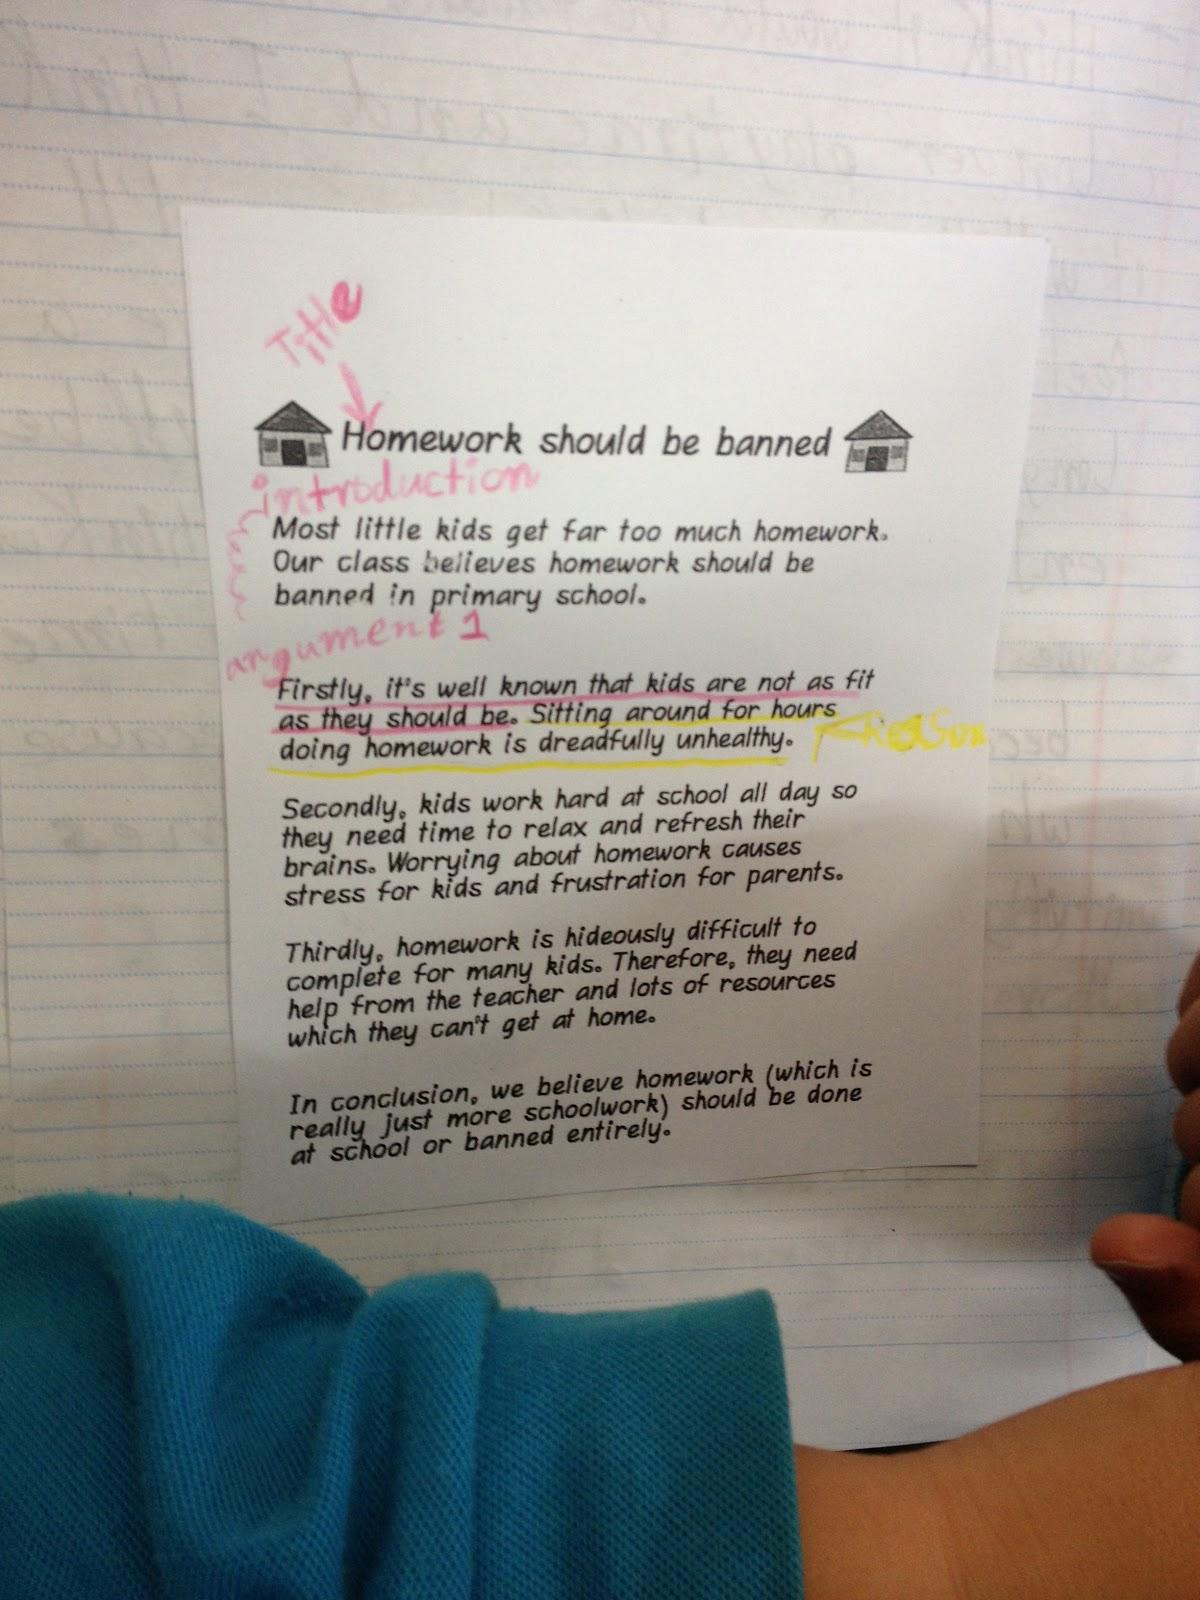 essay on homework should be banned